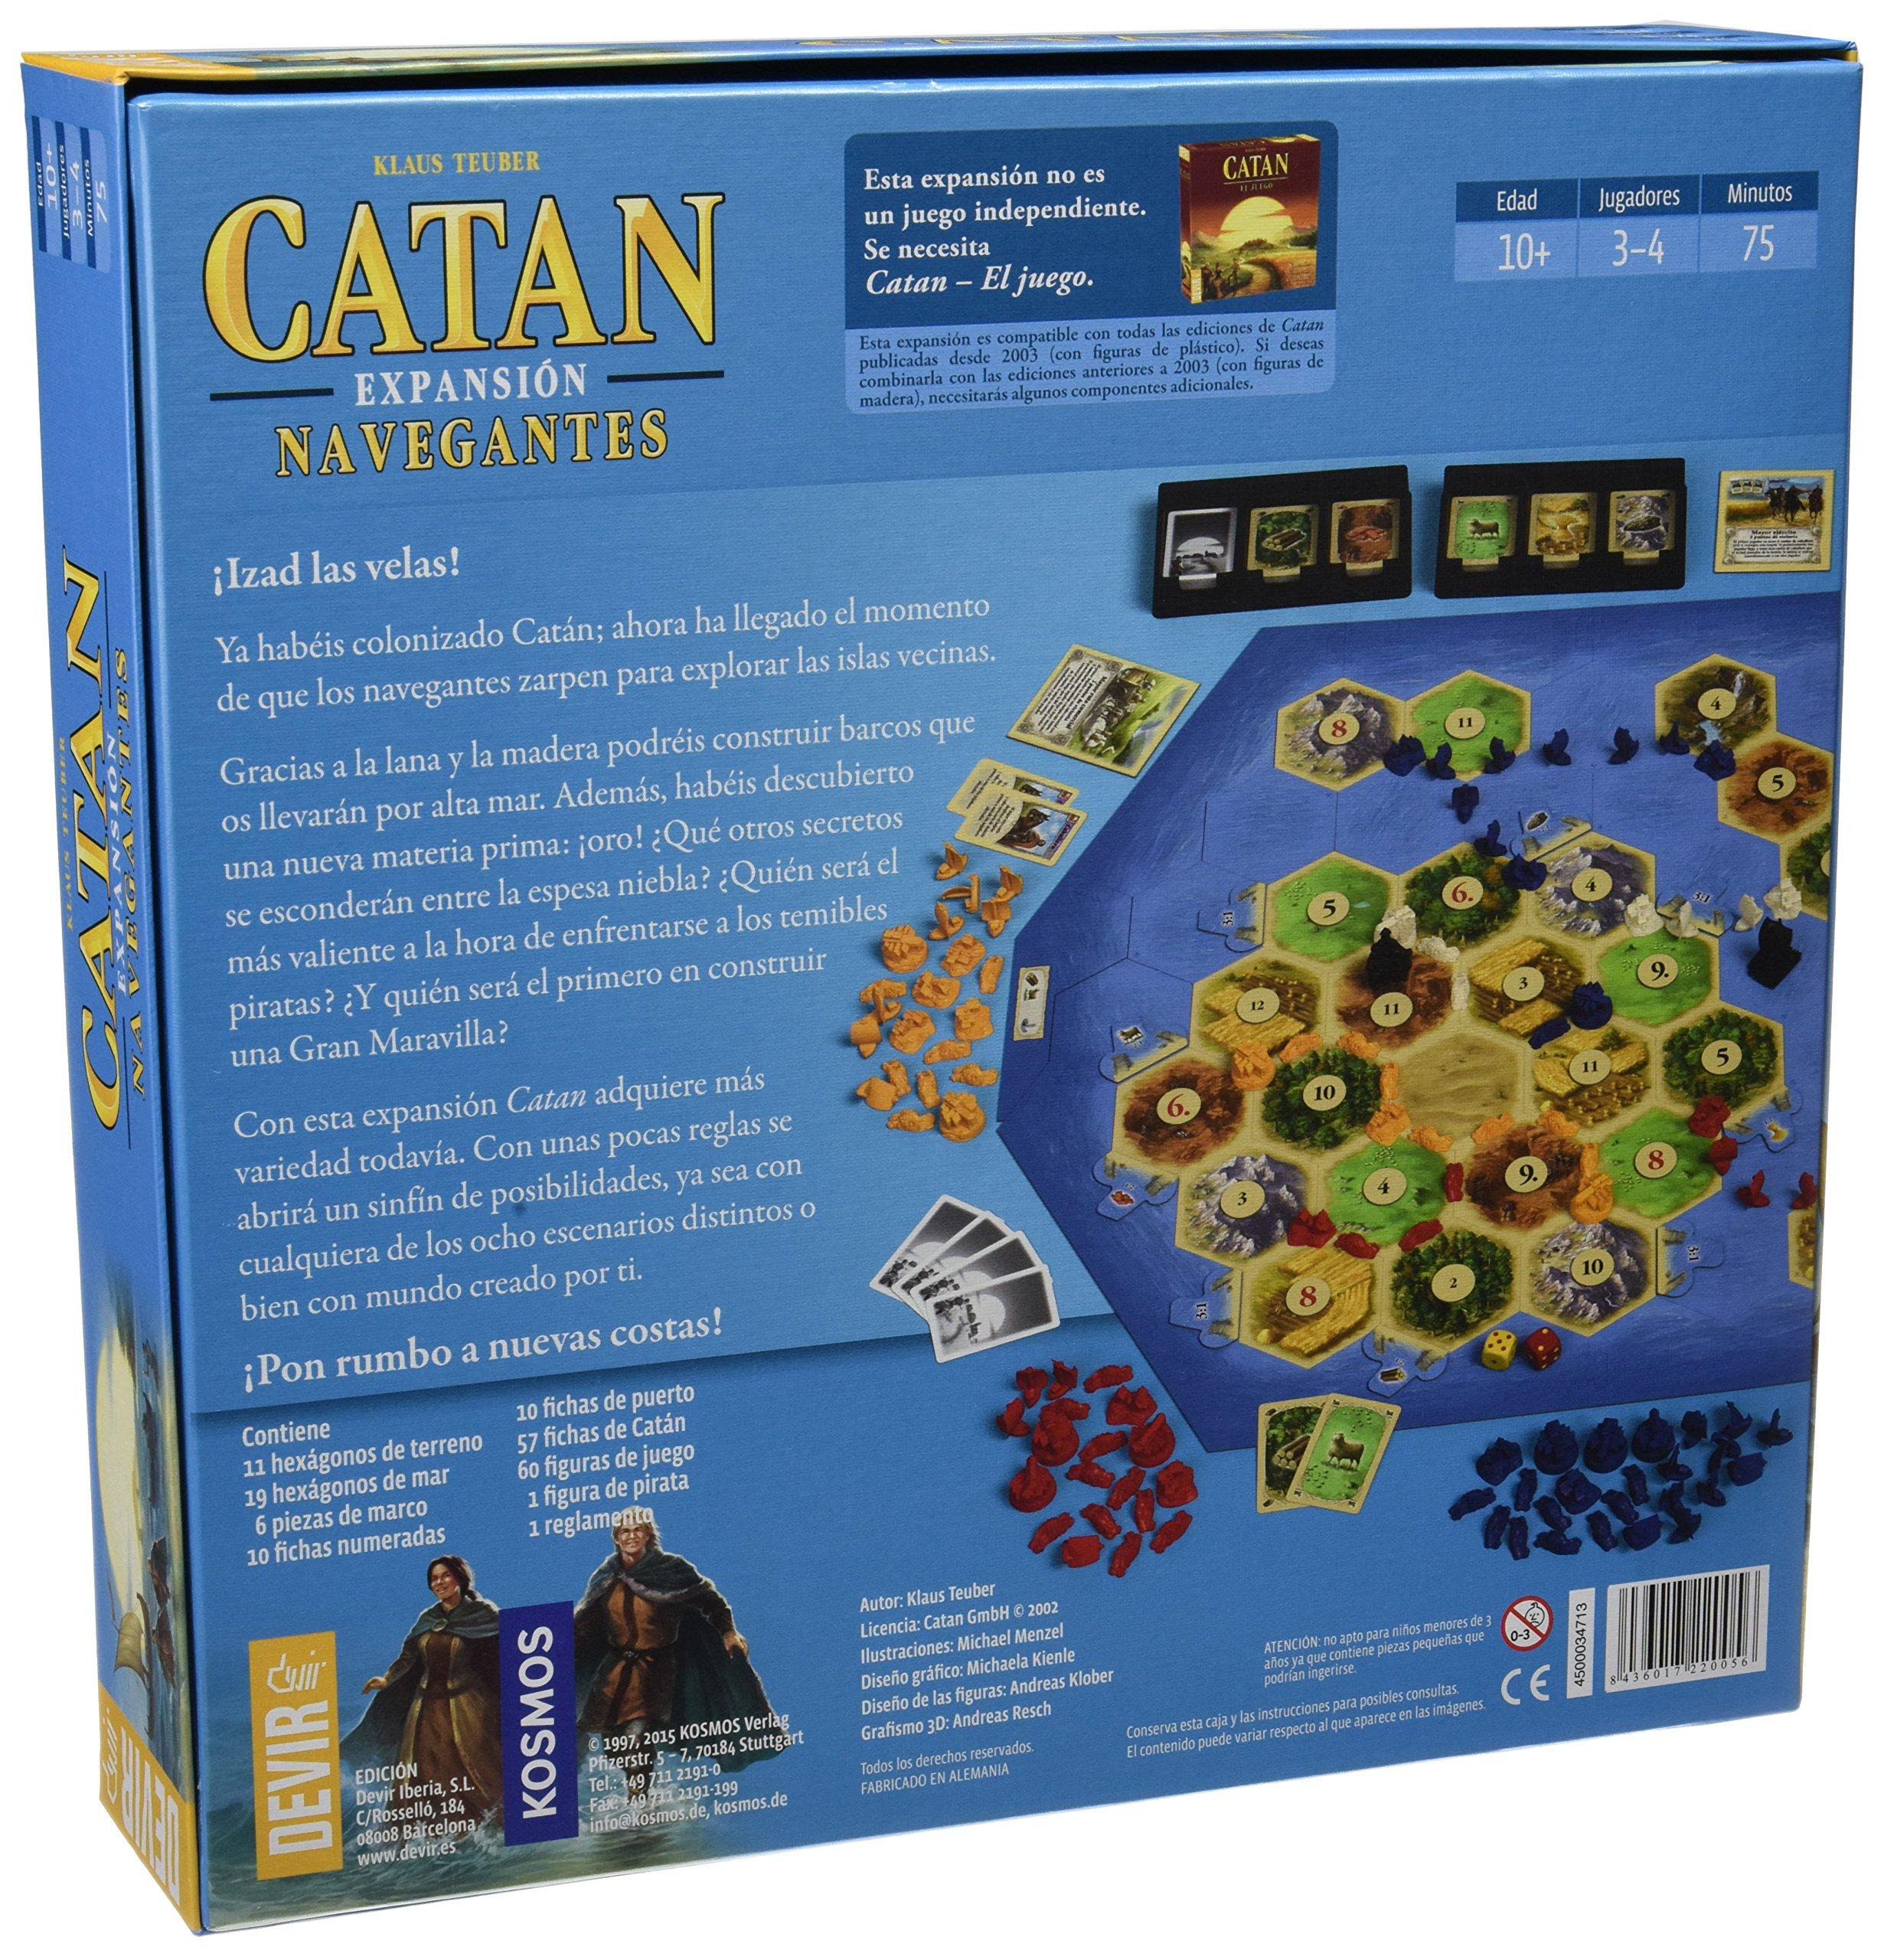 Comprar Devir - Catan, expansión Navegantes, juego de mesa (BGNAVEGANTES)